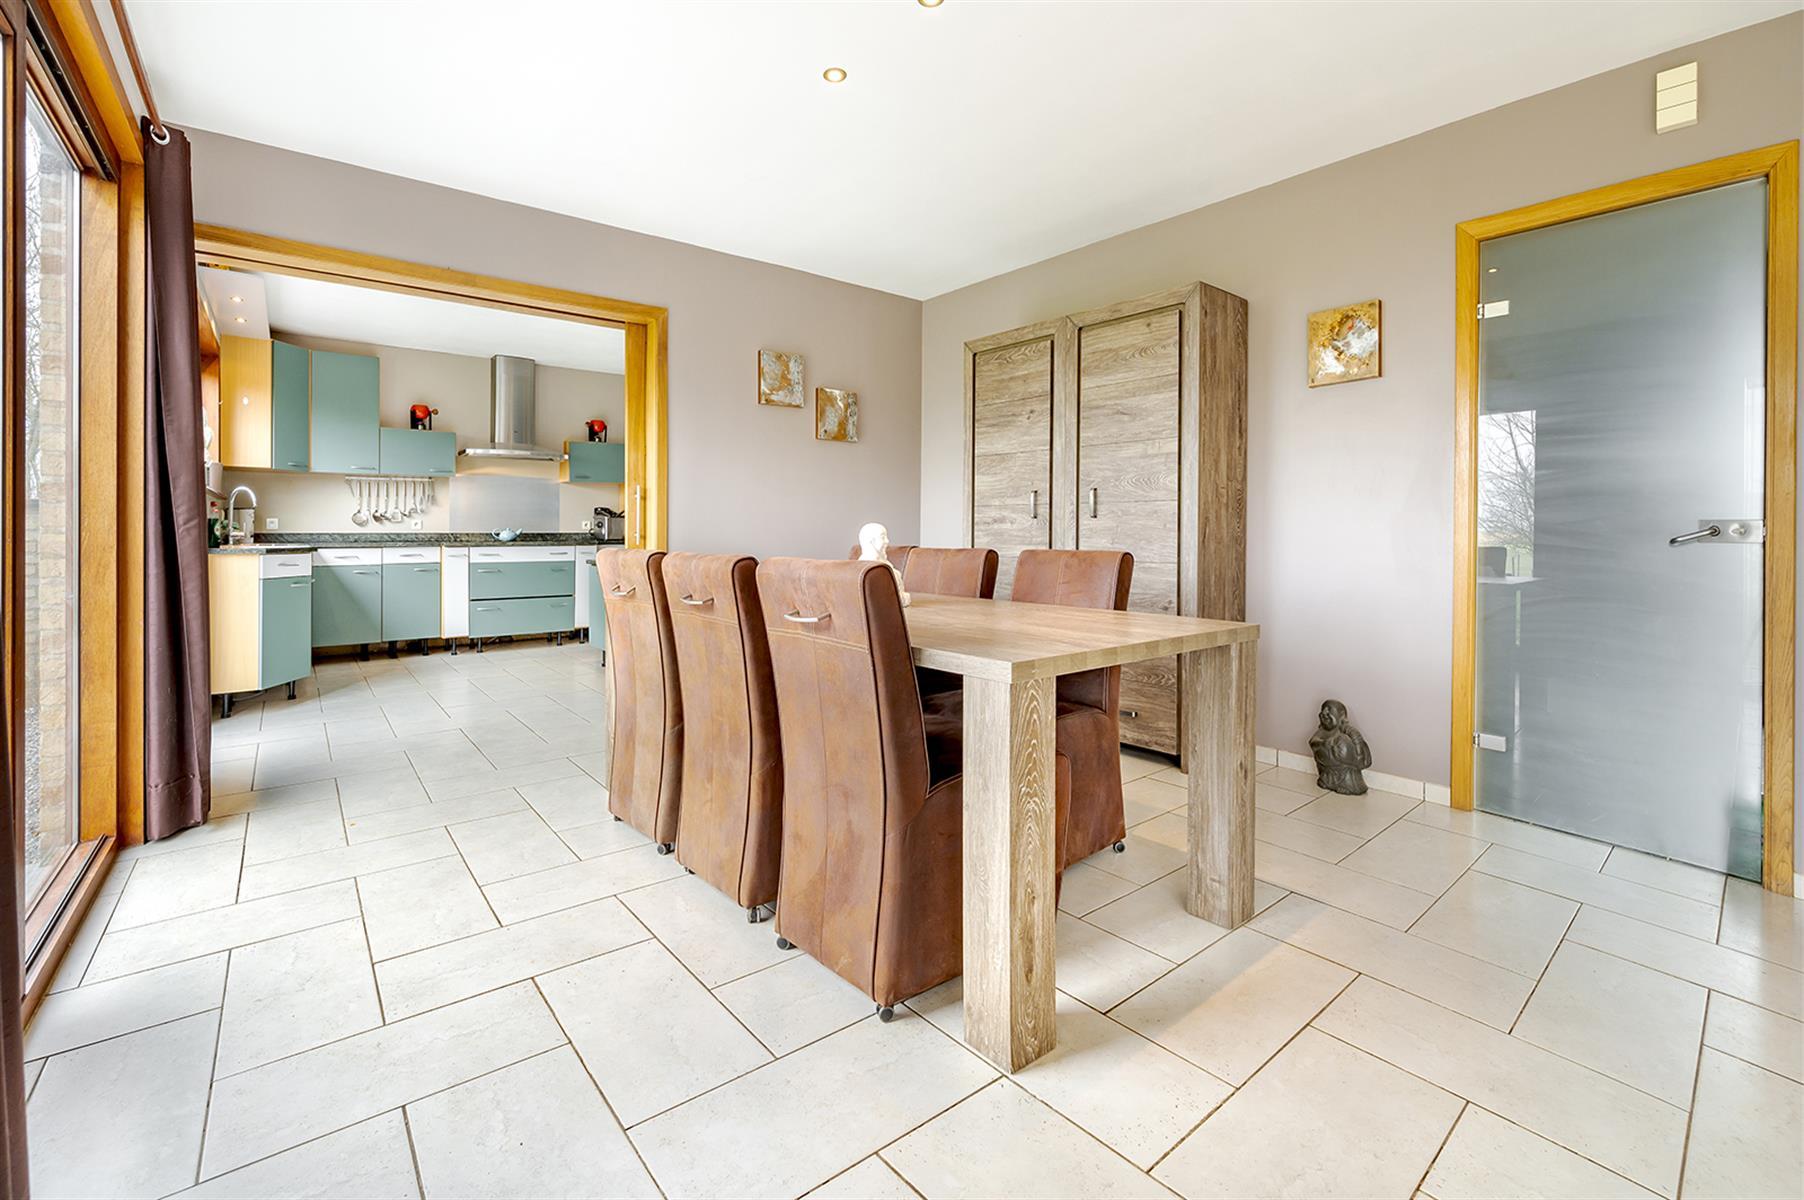 Maison - Orp-Jauche - #4014627-6